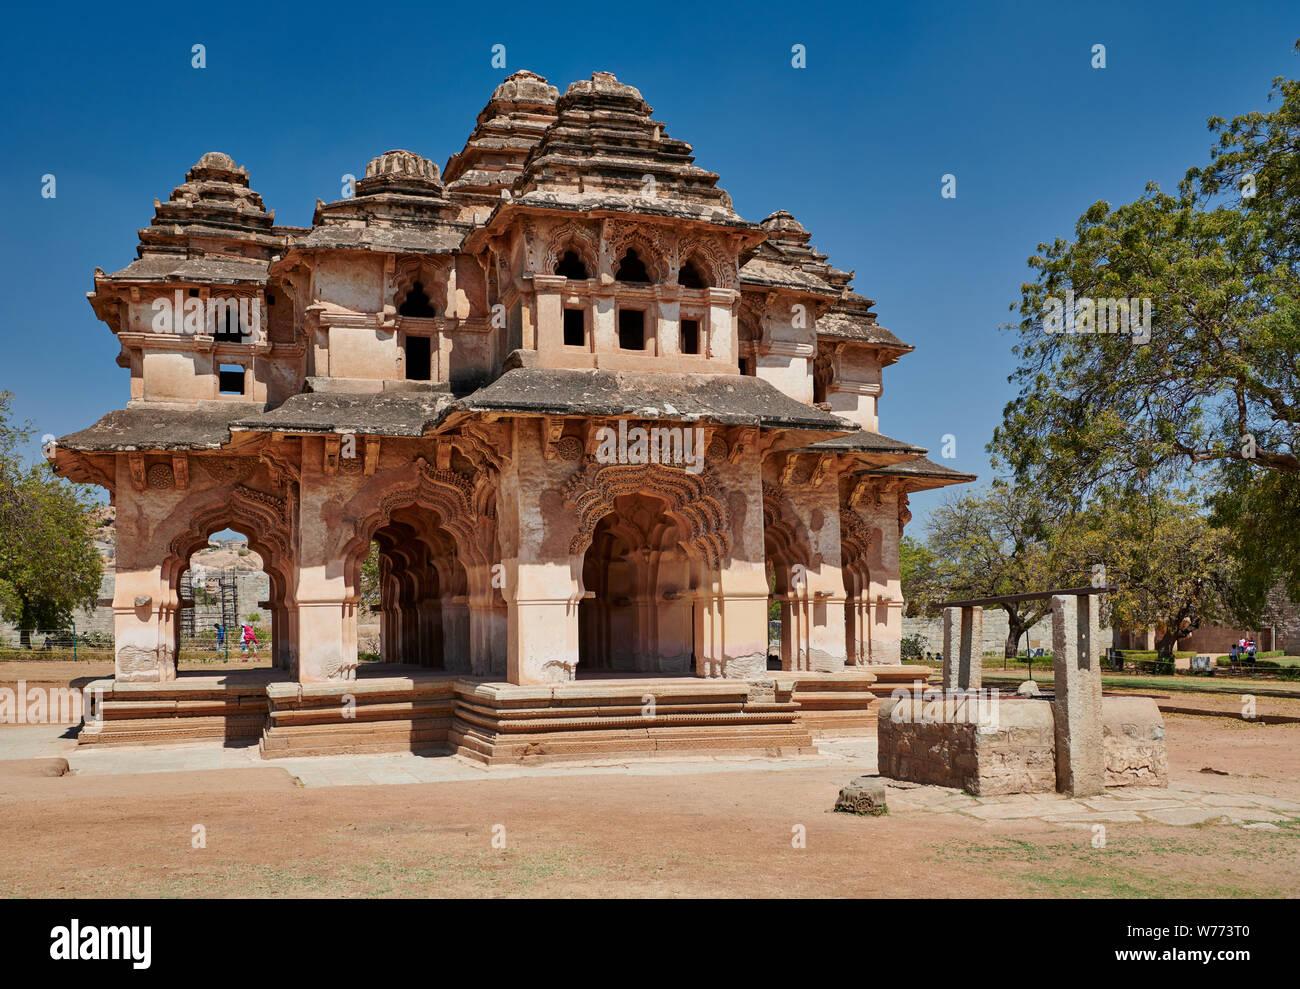 Lotus Mahal, Hampi, MUNDIAL DE LA UNESCO sitio heritge, Karnataka, India Foto de stock